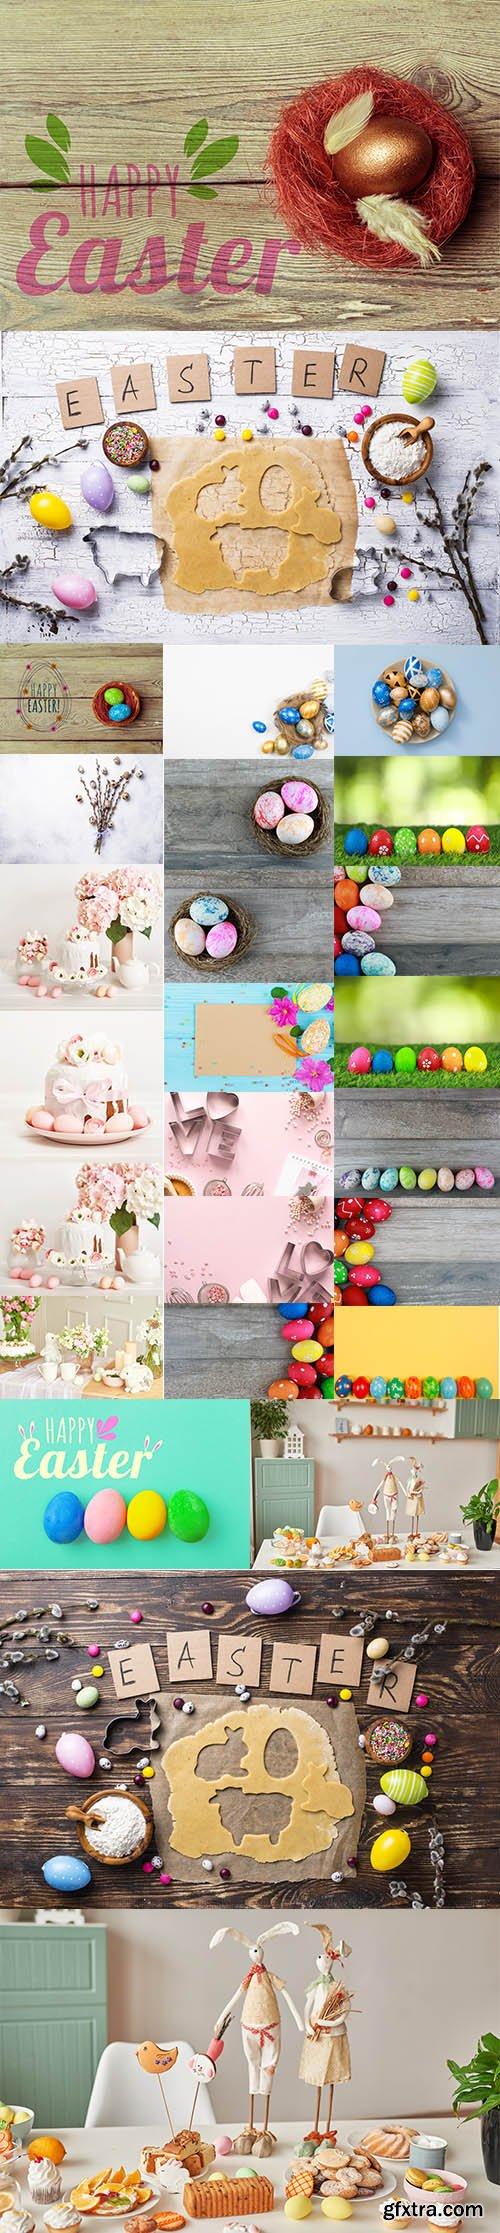 Happy Easter Holiday Decorations Bundle - Premium UHQ JPEG Stock Photo